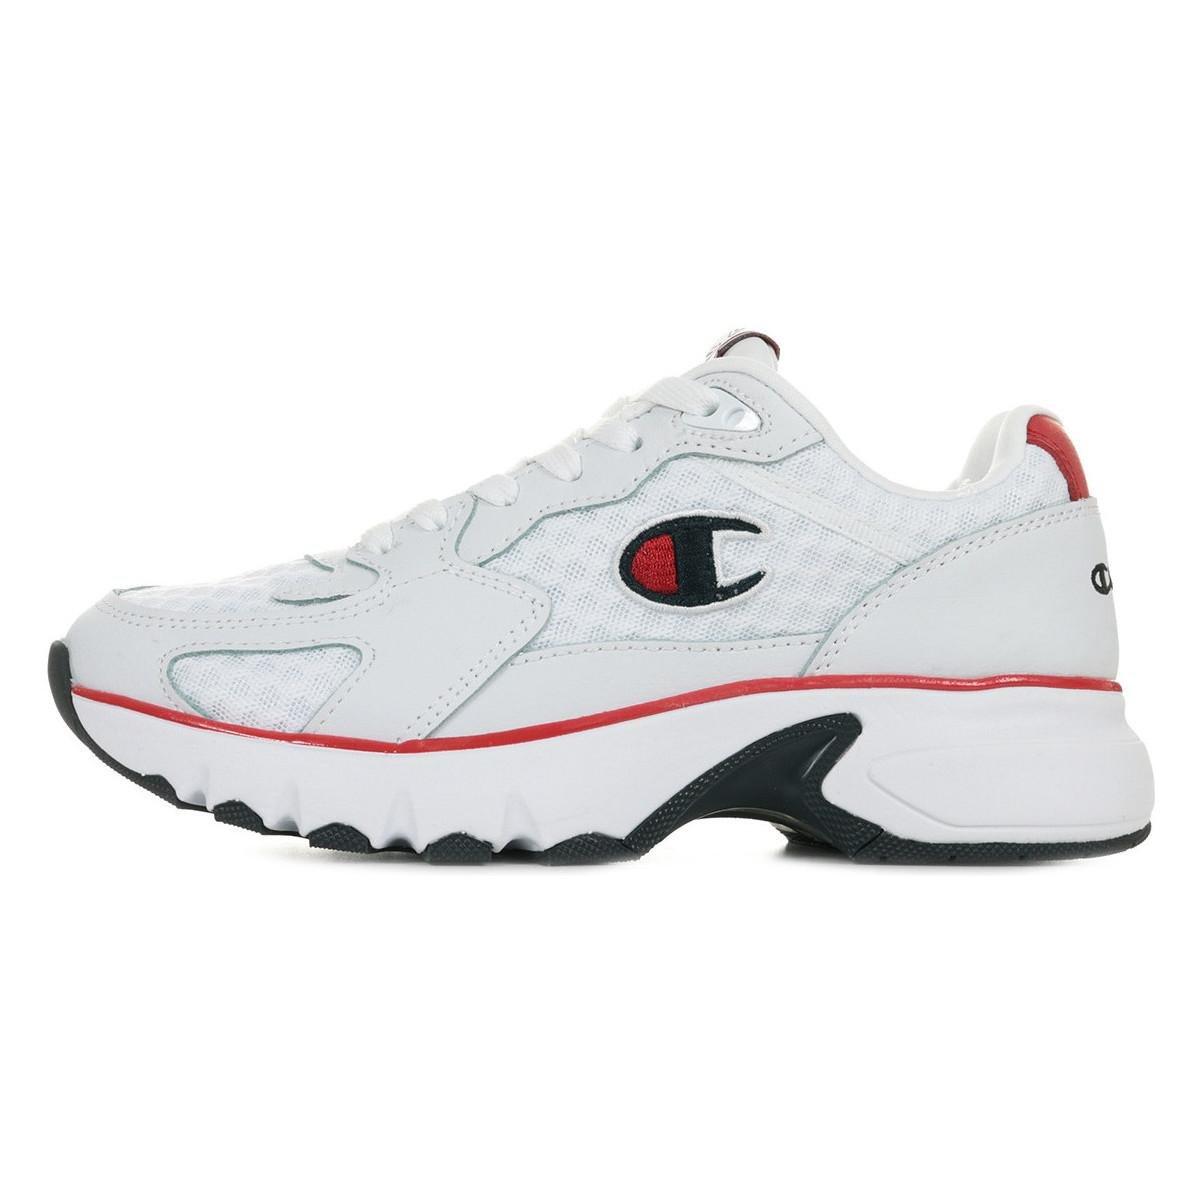 CWA-1 Chaussures Champion en coloris Blanc